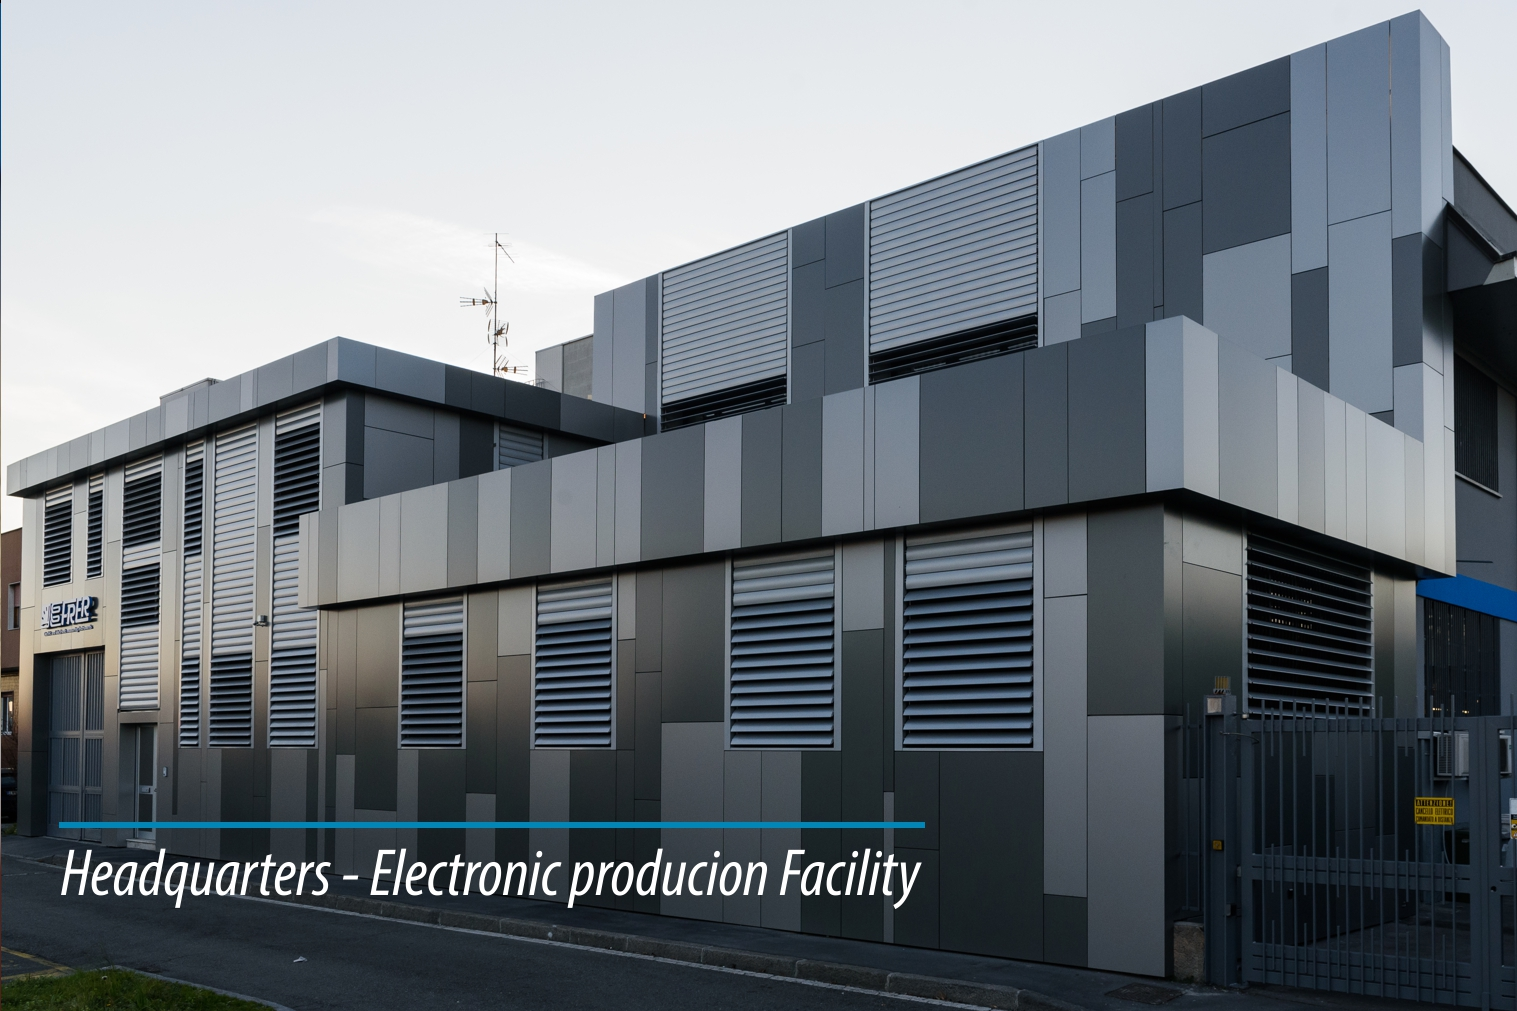 Headquarters - Electronic production Facility